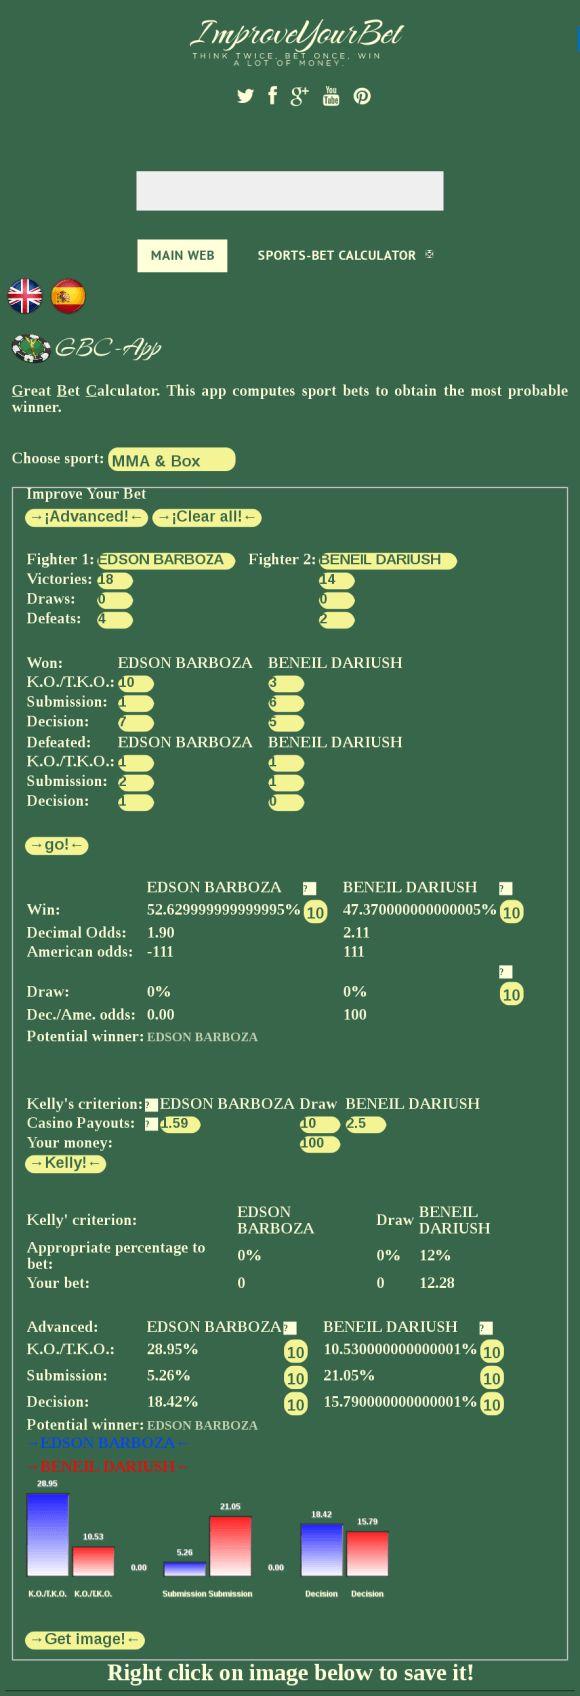 UFC fight night 106 forecast predictions and picks EDSON BARBOZA Vs BENEIL DARIUSH